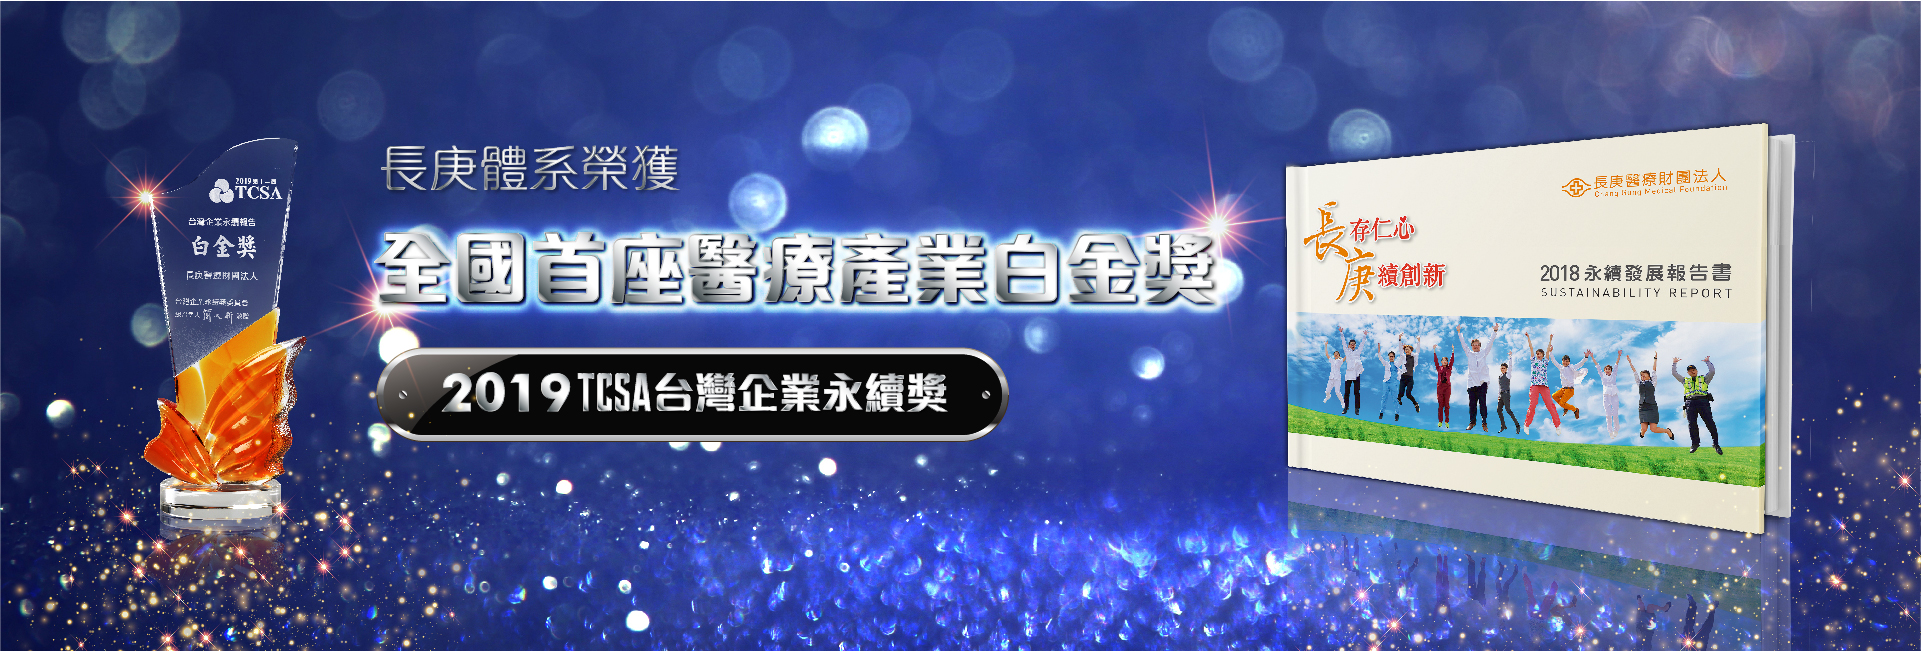 TCSA台灣企業永續獎